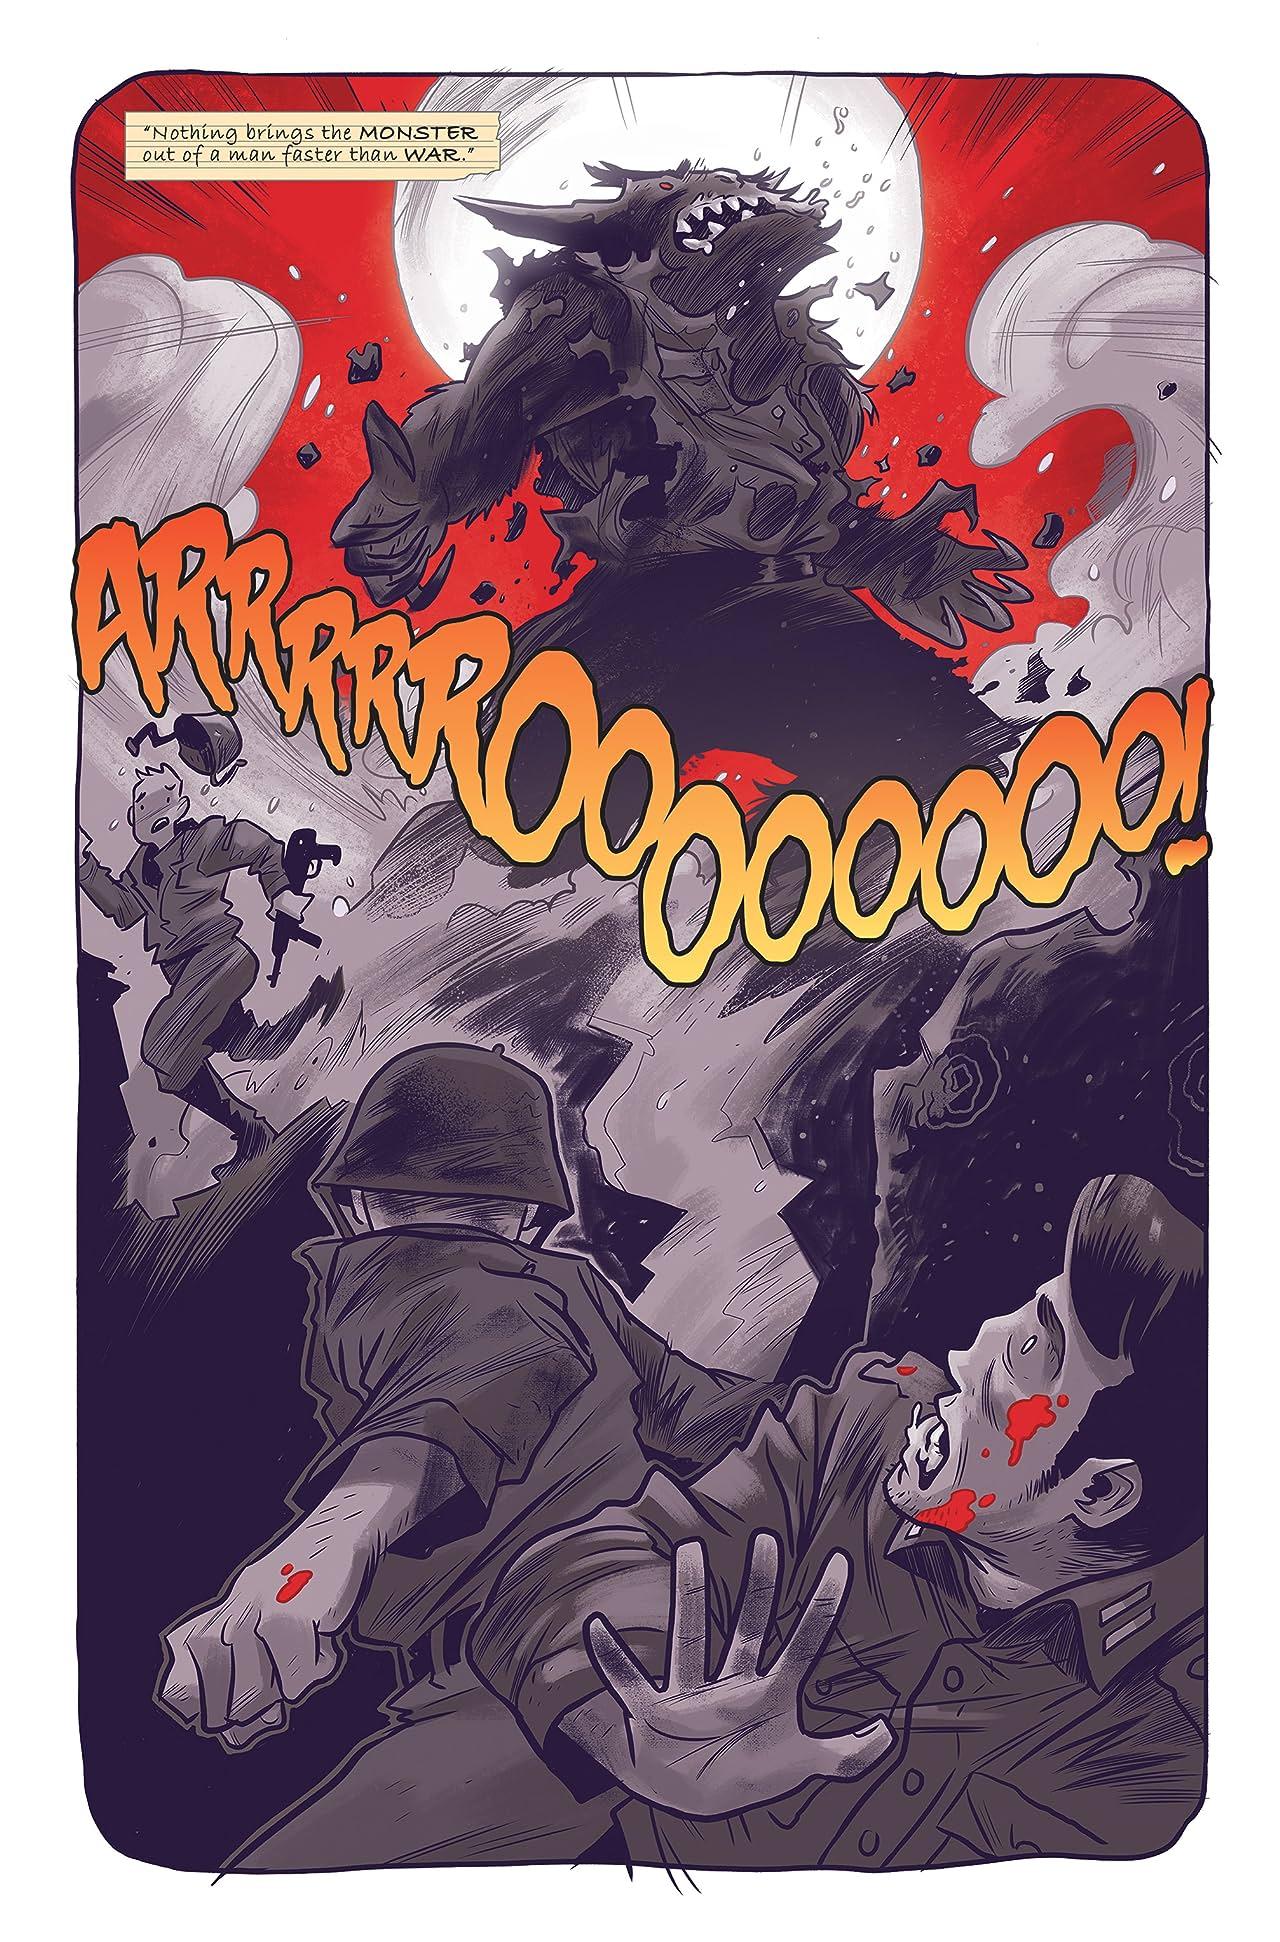 Namwolf #2